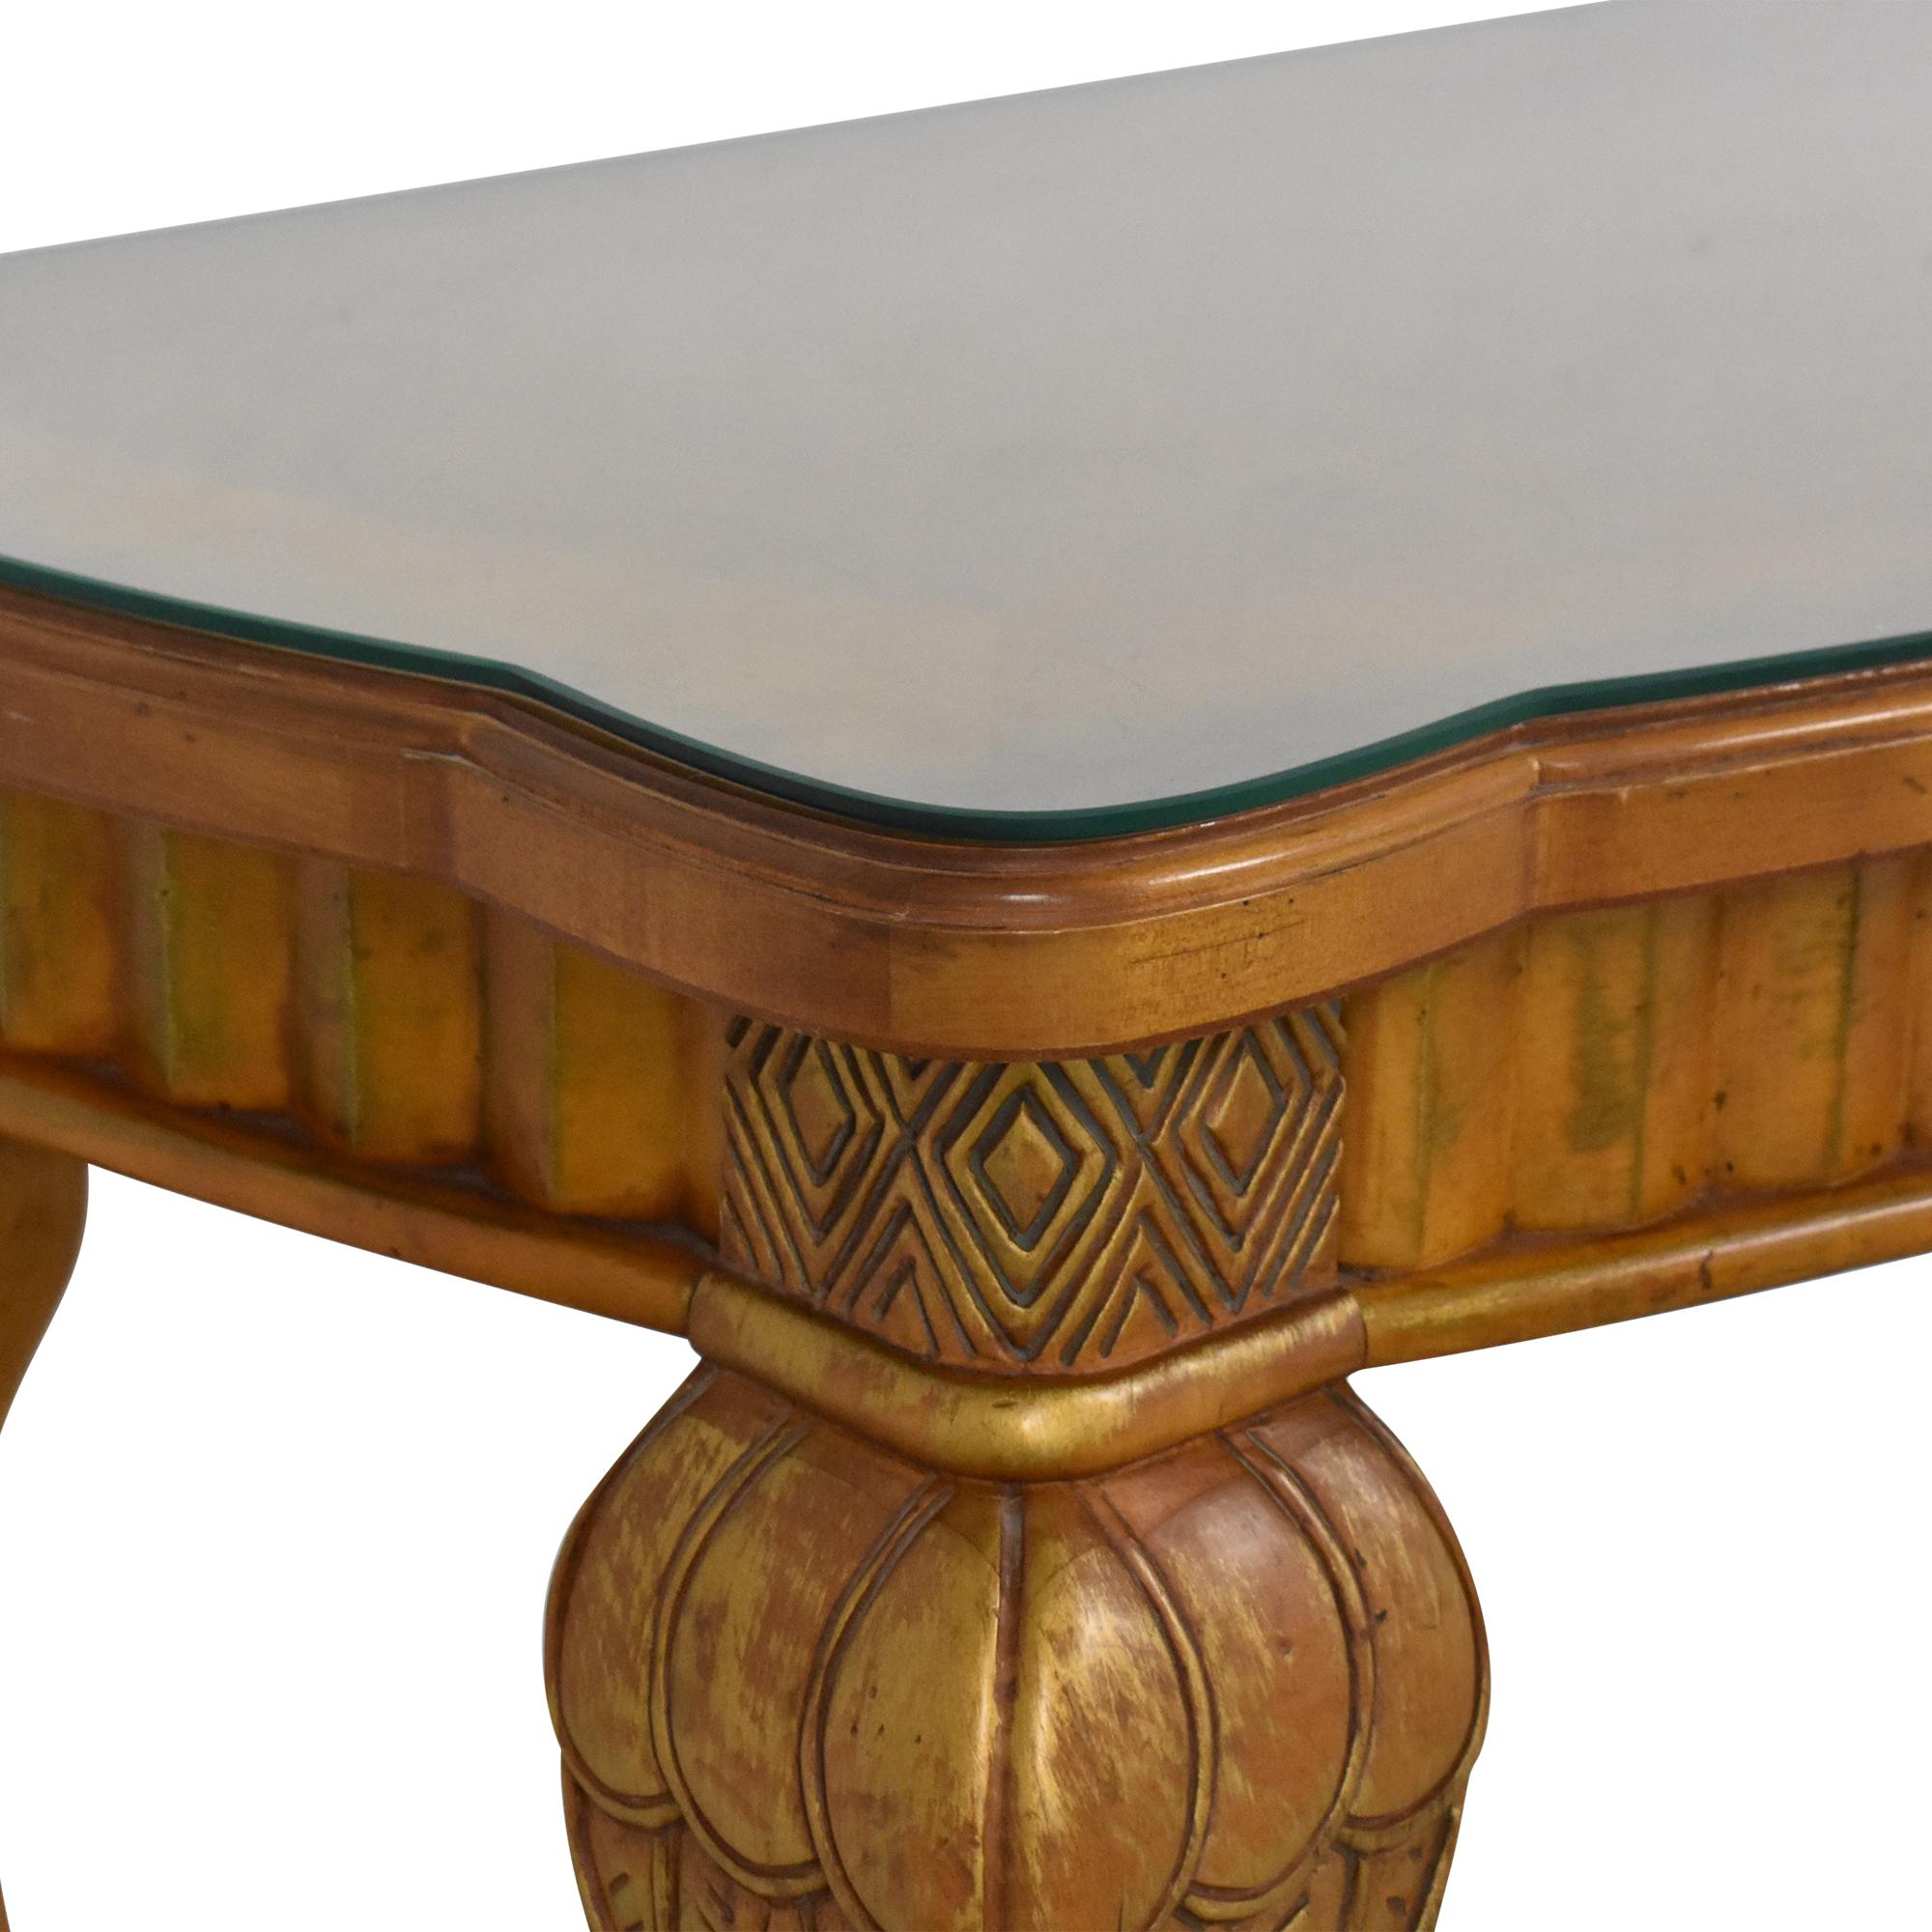 Century Furniture Century Furniture Cabriole Console Table nyc